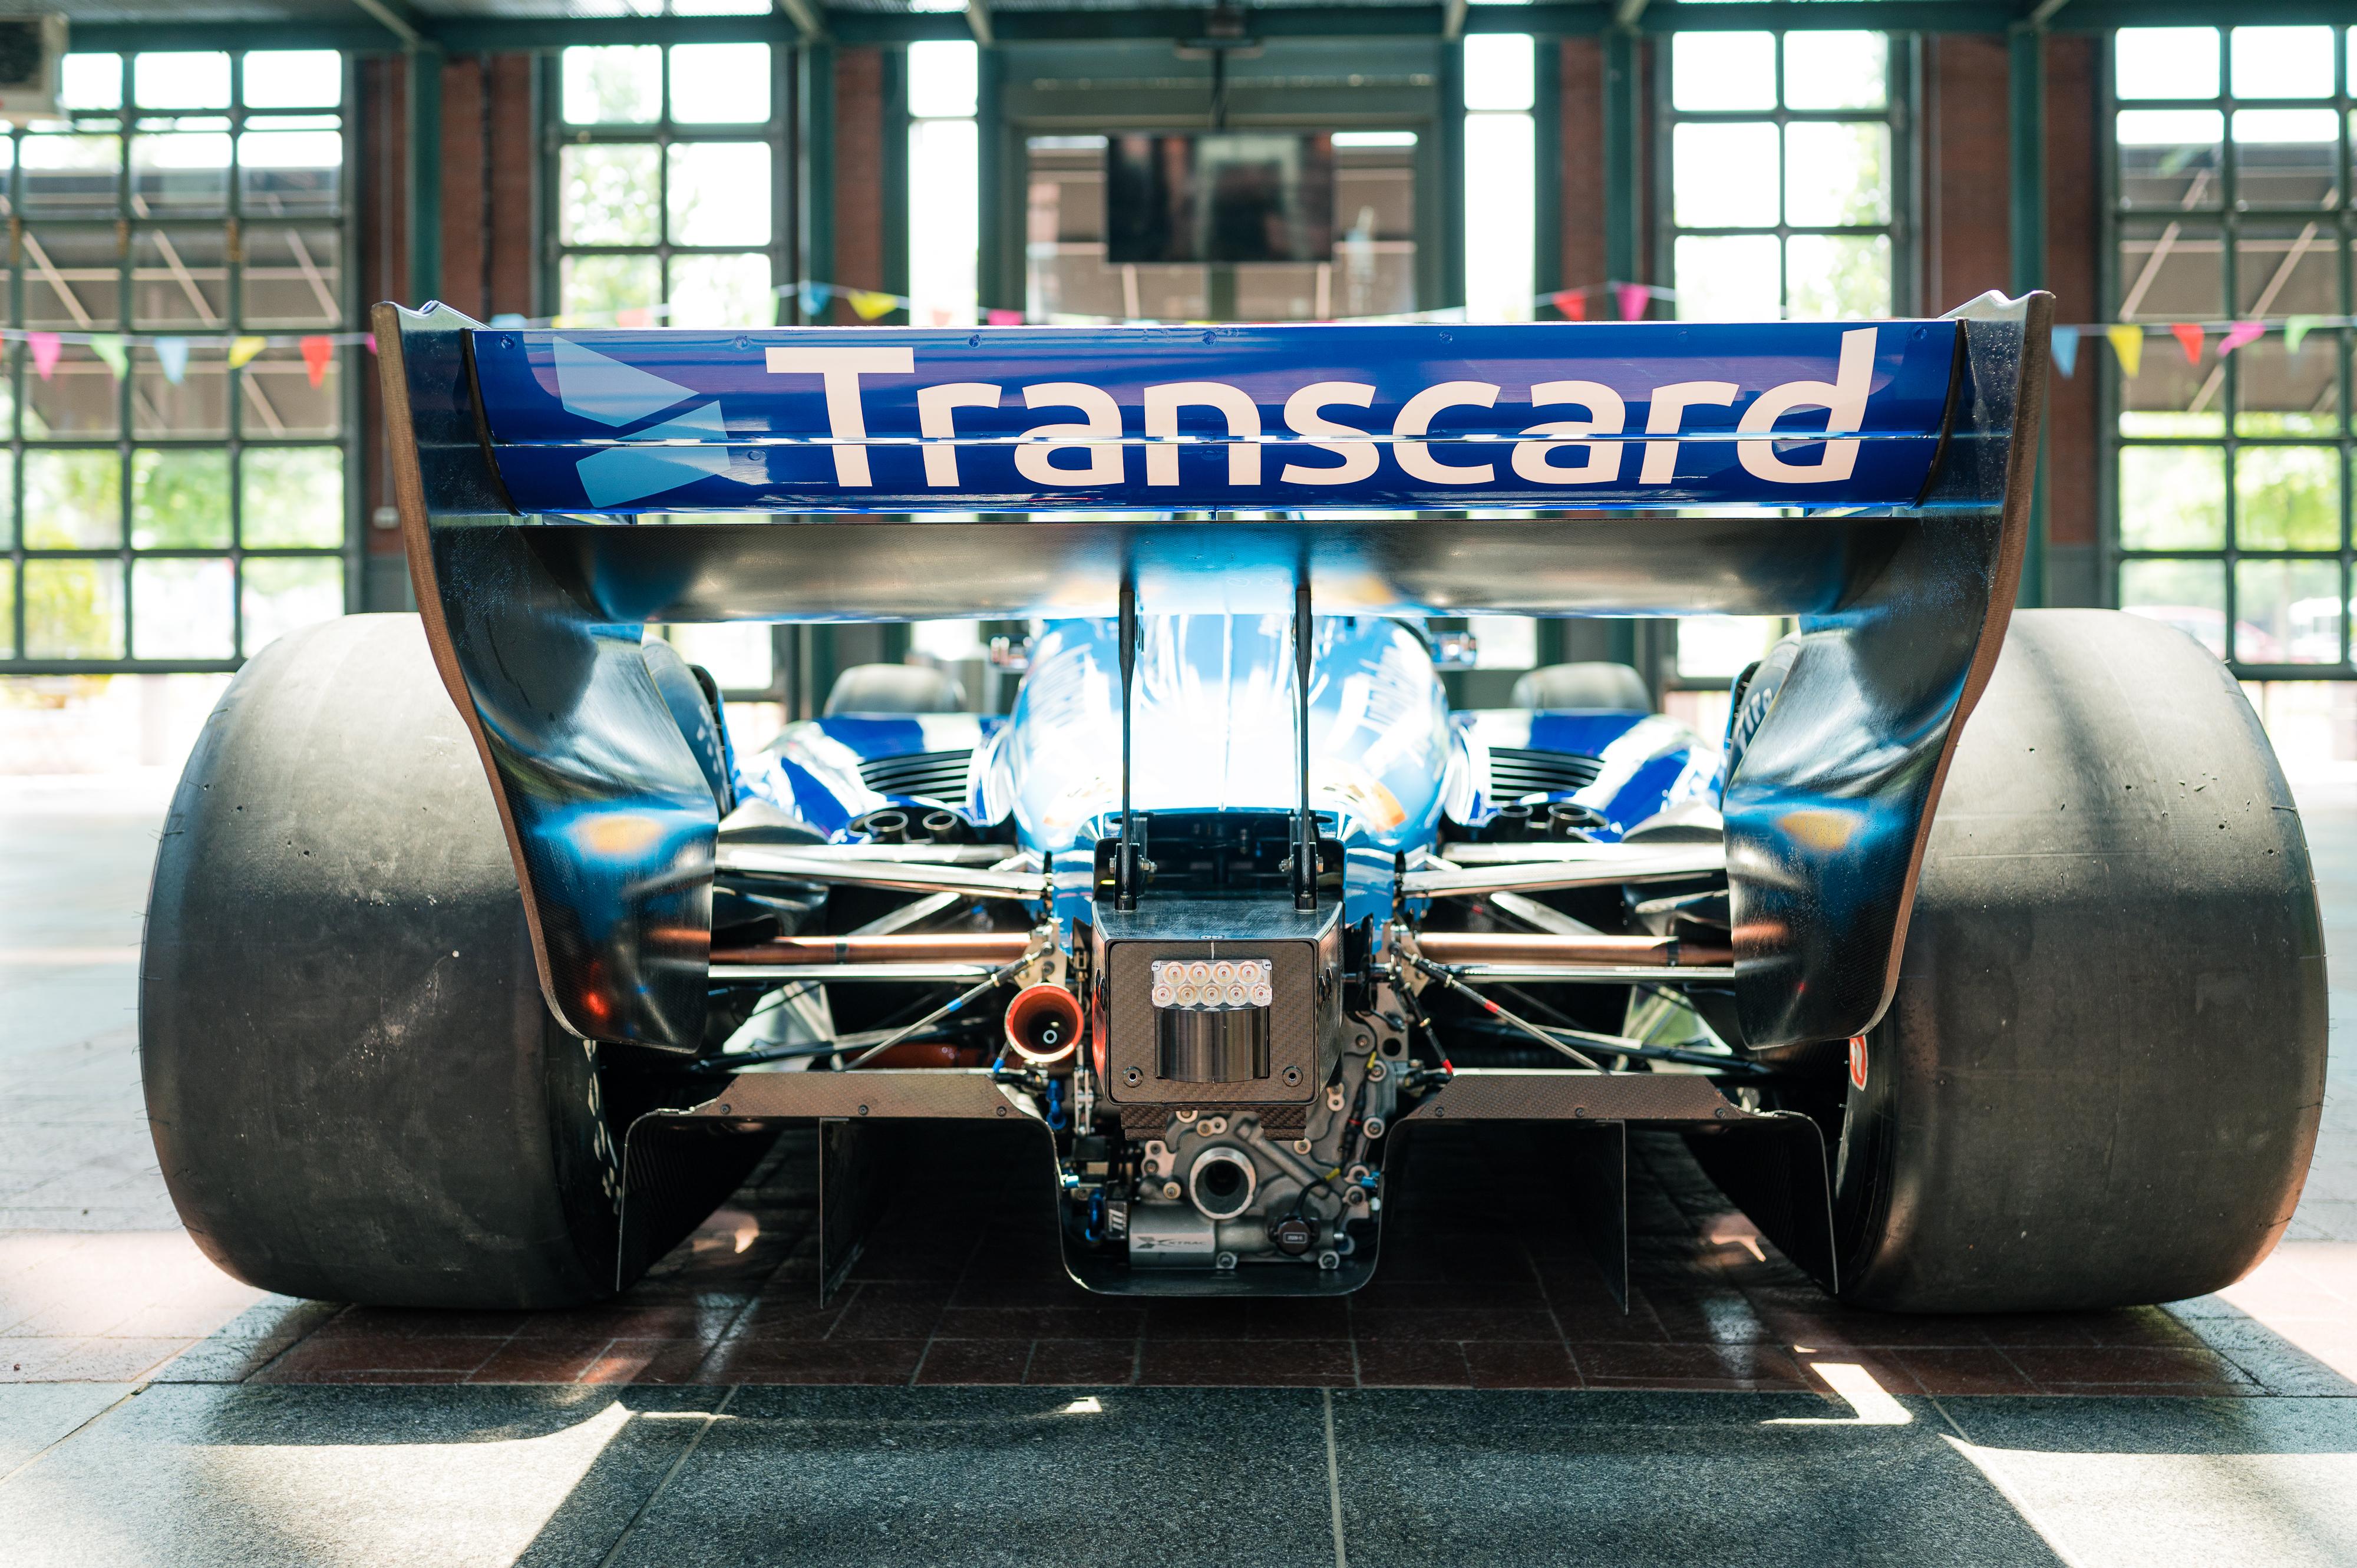 transcard-car-reveal-04